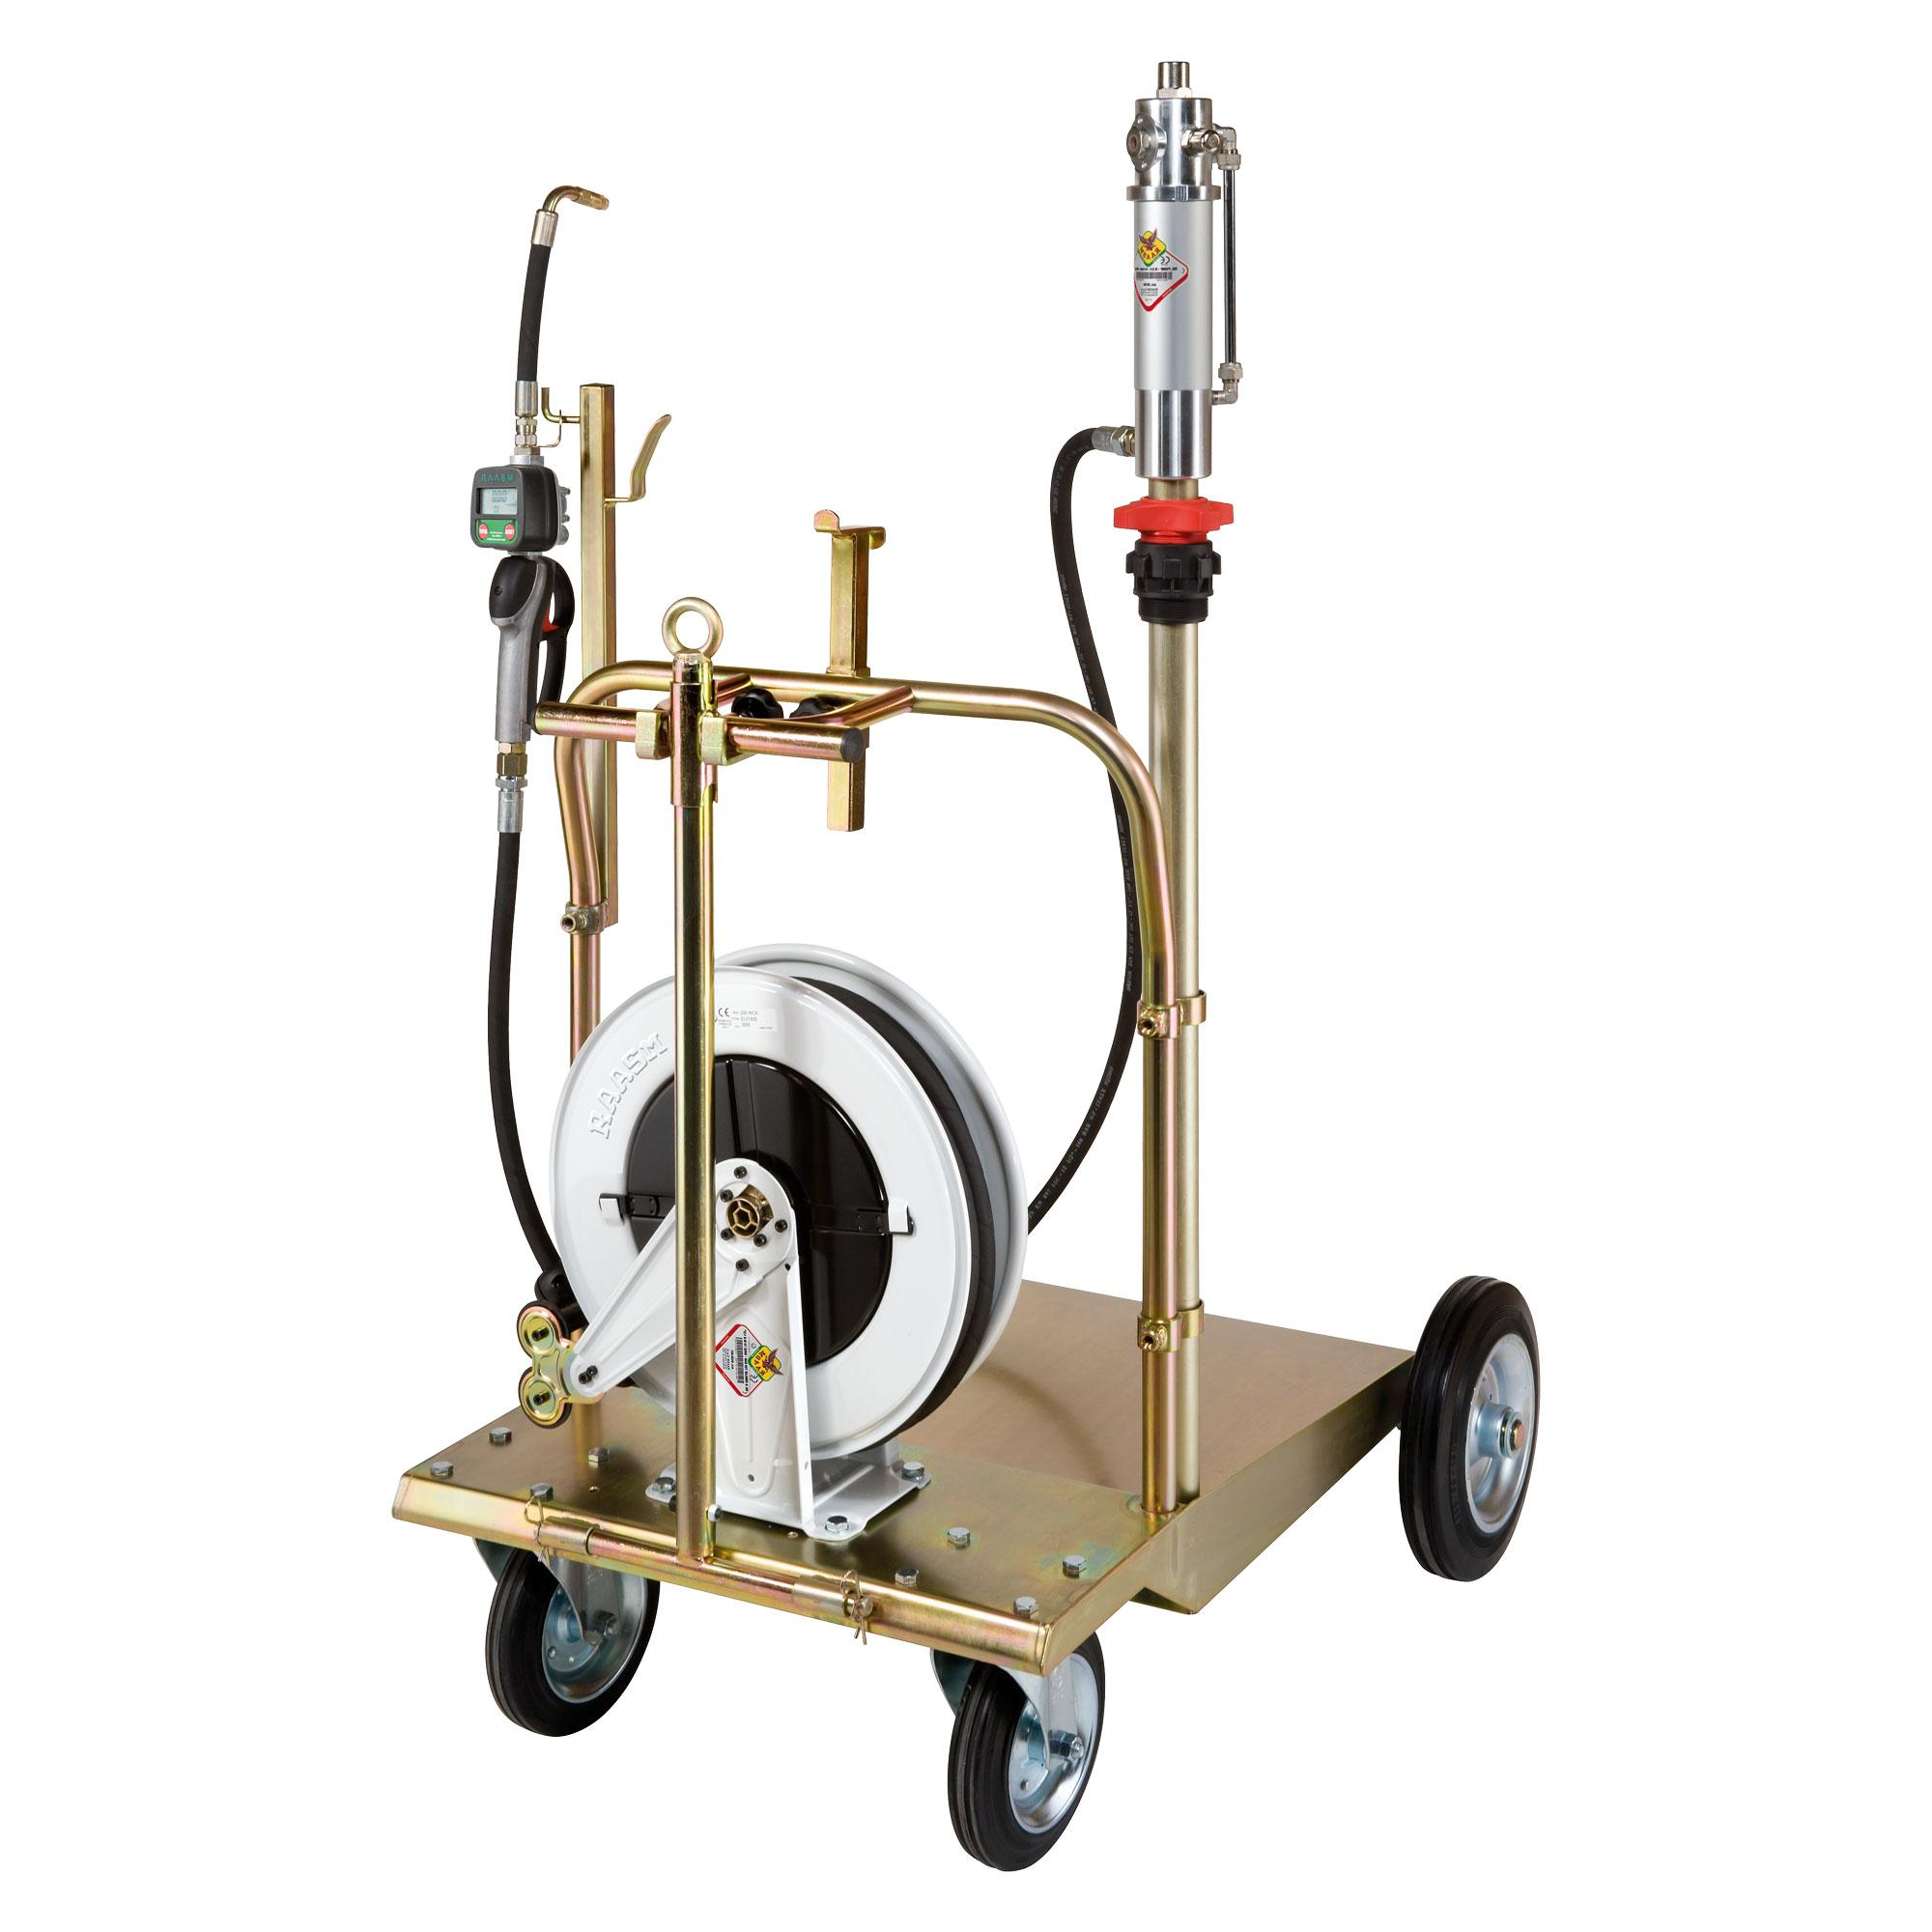 37100 - 5:1 Ratio, High Volume Super Trolley Dispensing Kit